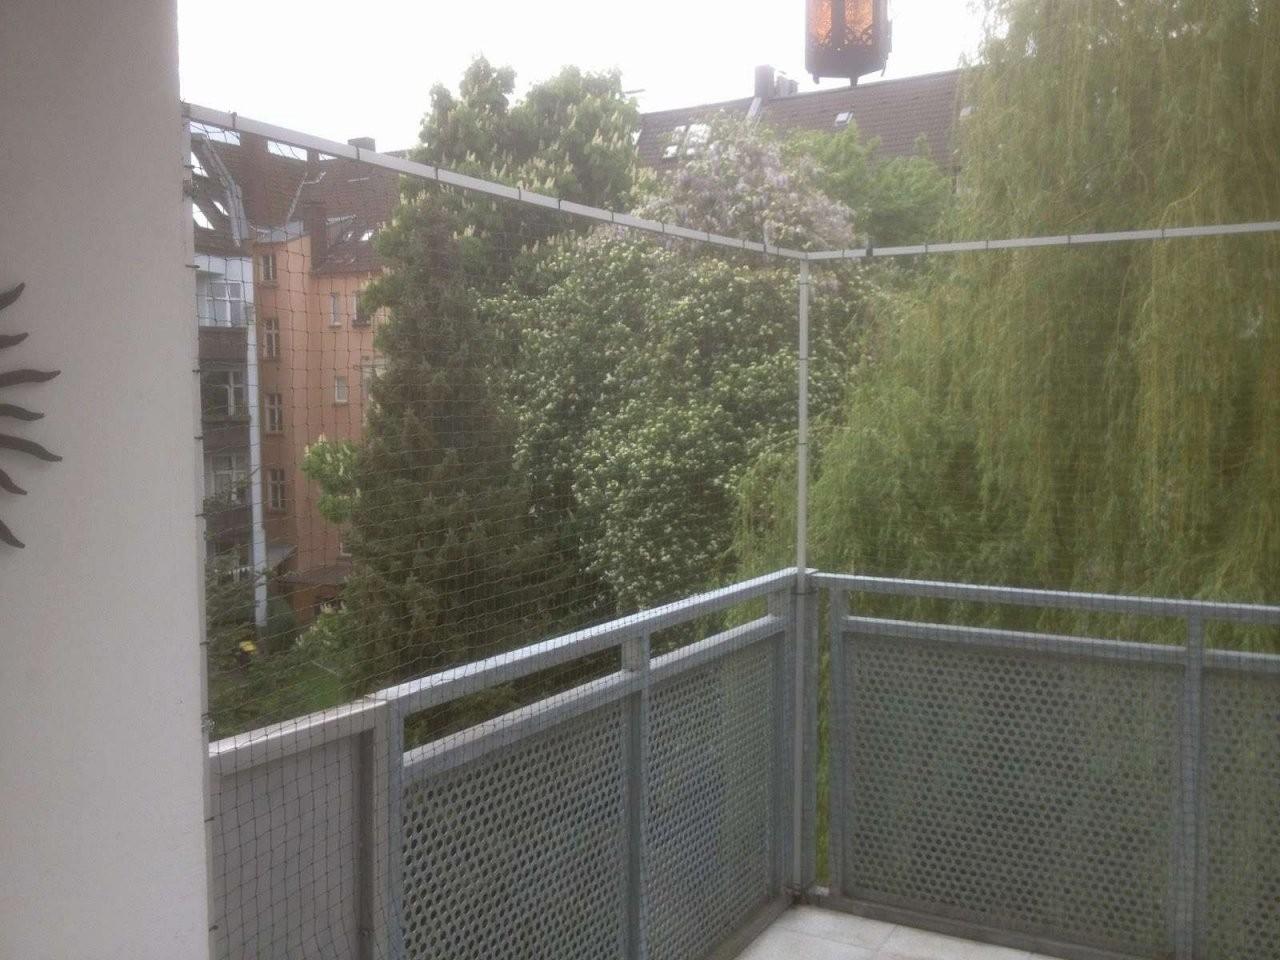 Ideen 41 Zum Katzennetz Balkon Befestigen von Katzenschutznetz Balkon Ohne Bohren Bild